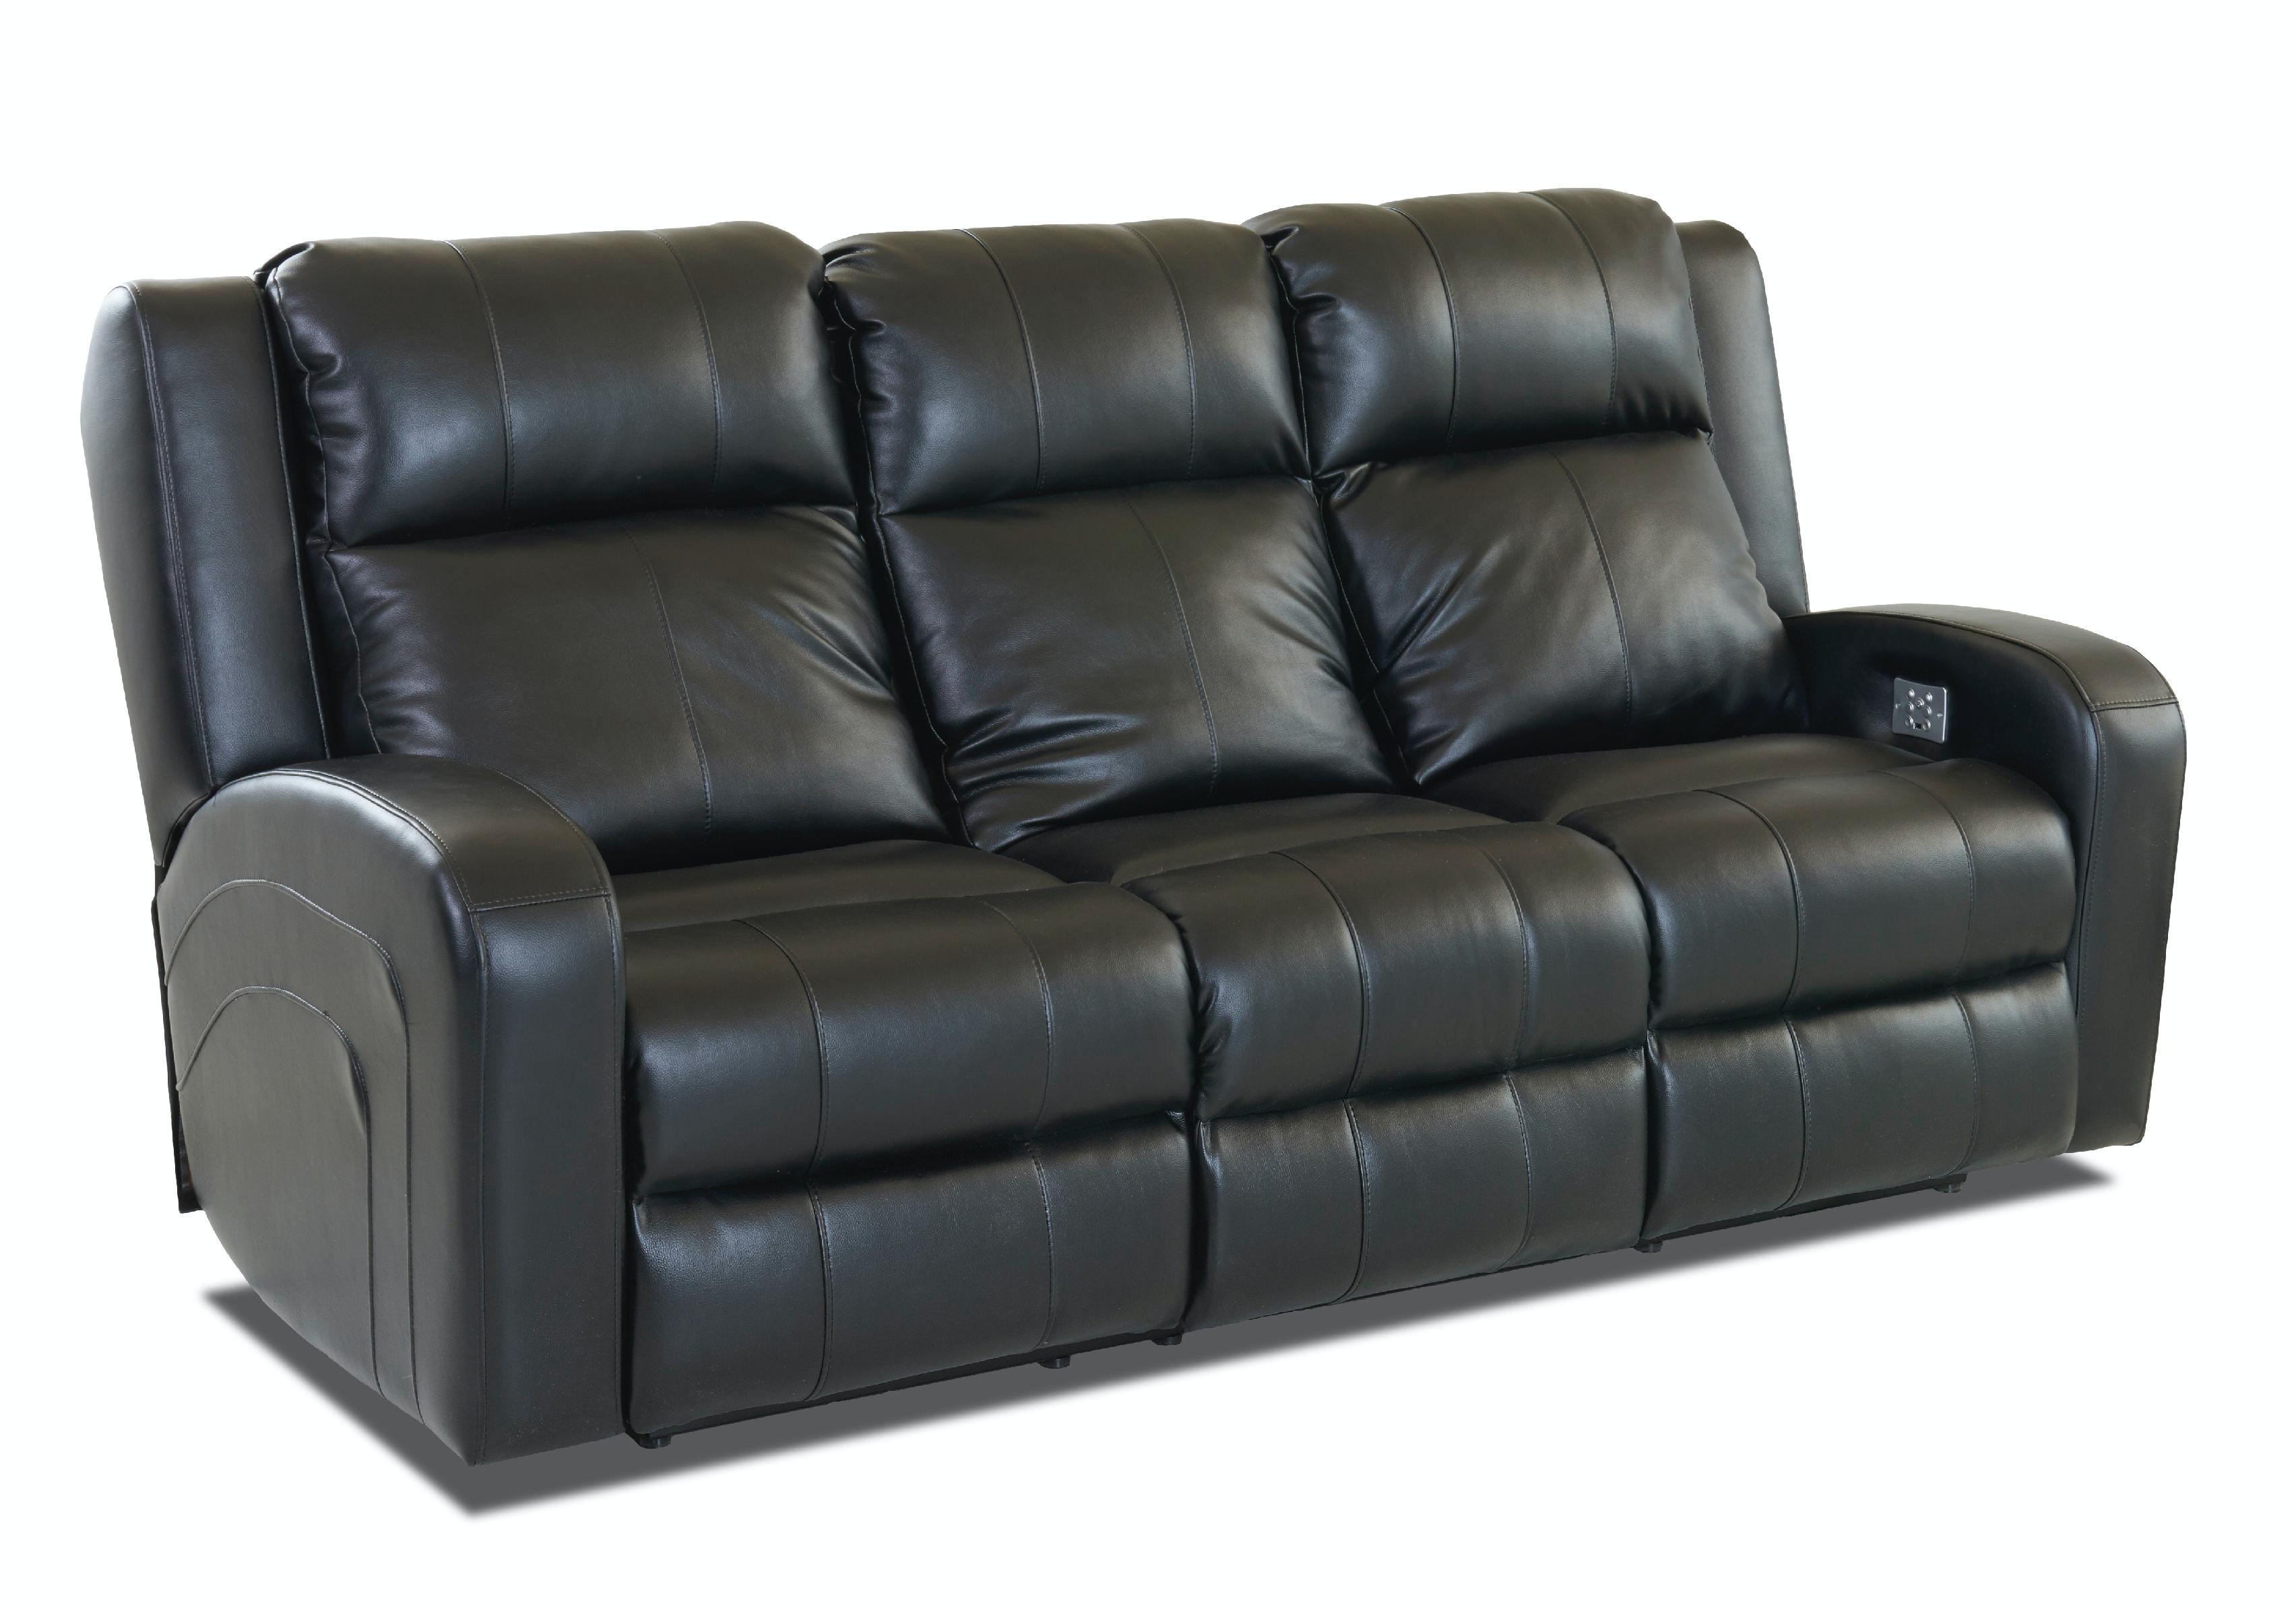 Klaussner Living Room Robinson Sofa 64943 8 Pwrs Hamilton Sofa